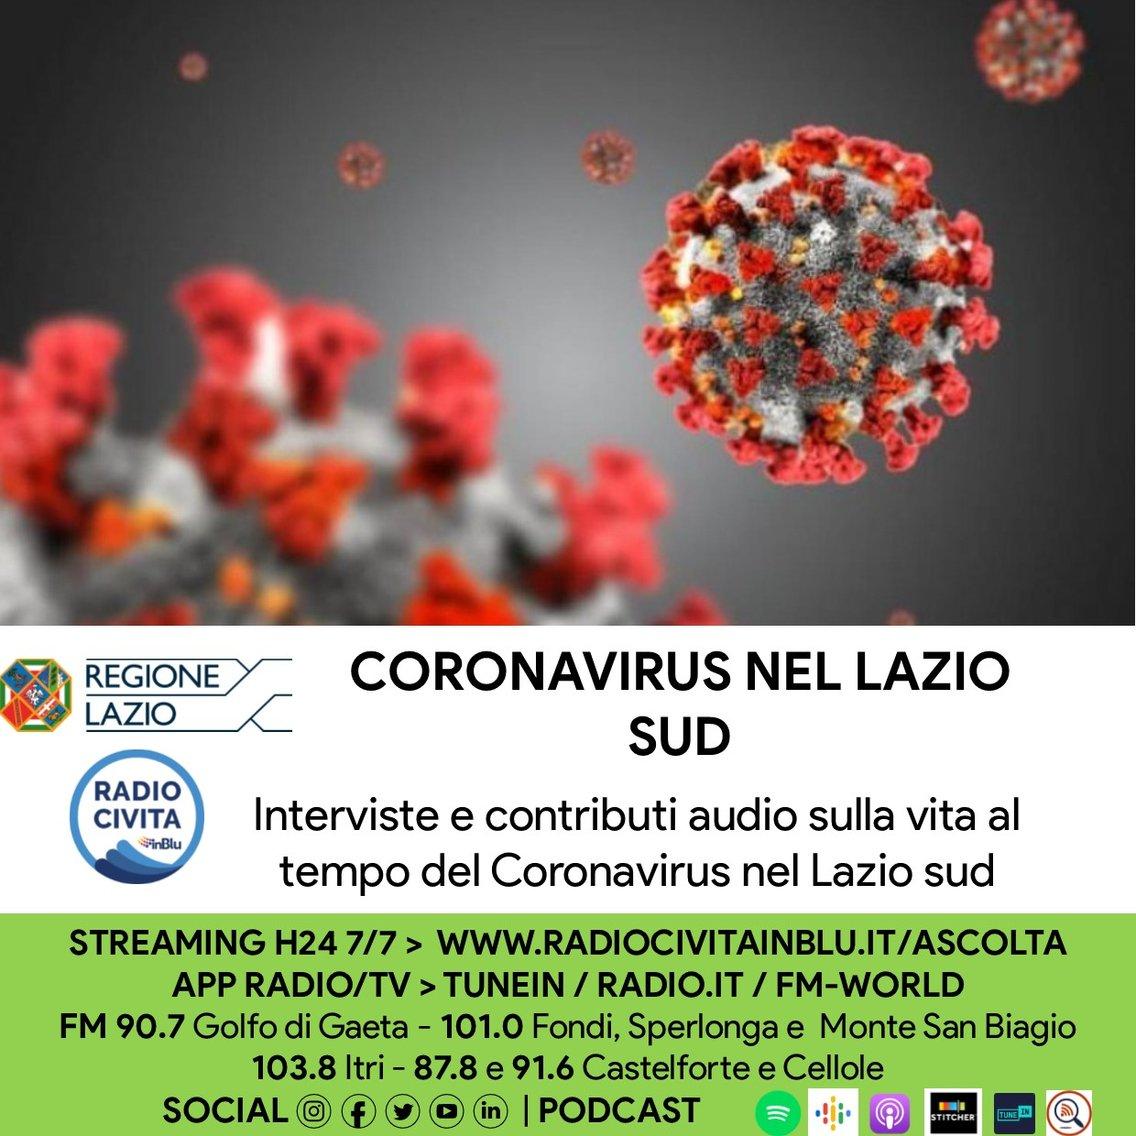 Coronavirus nel Lazio sud - Cover Image